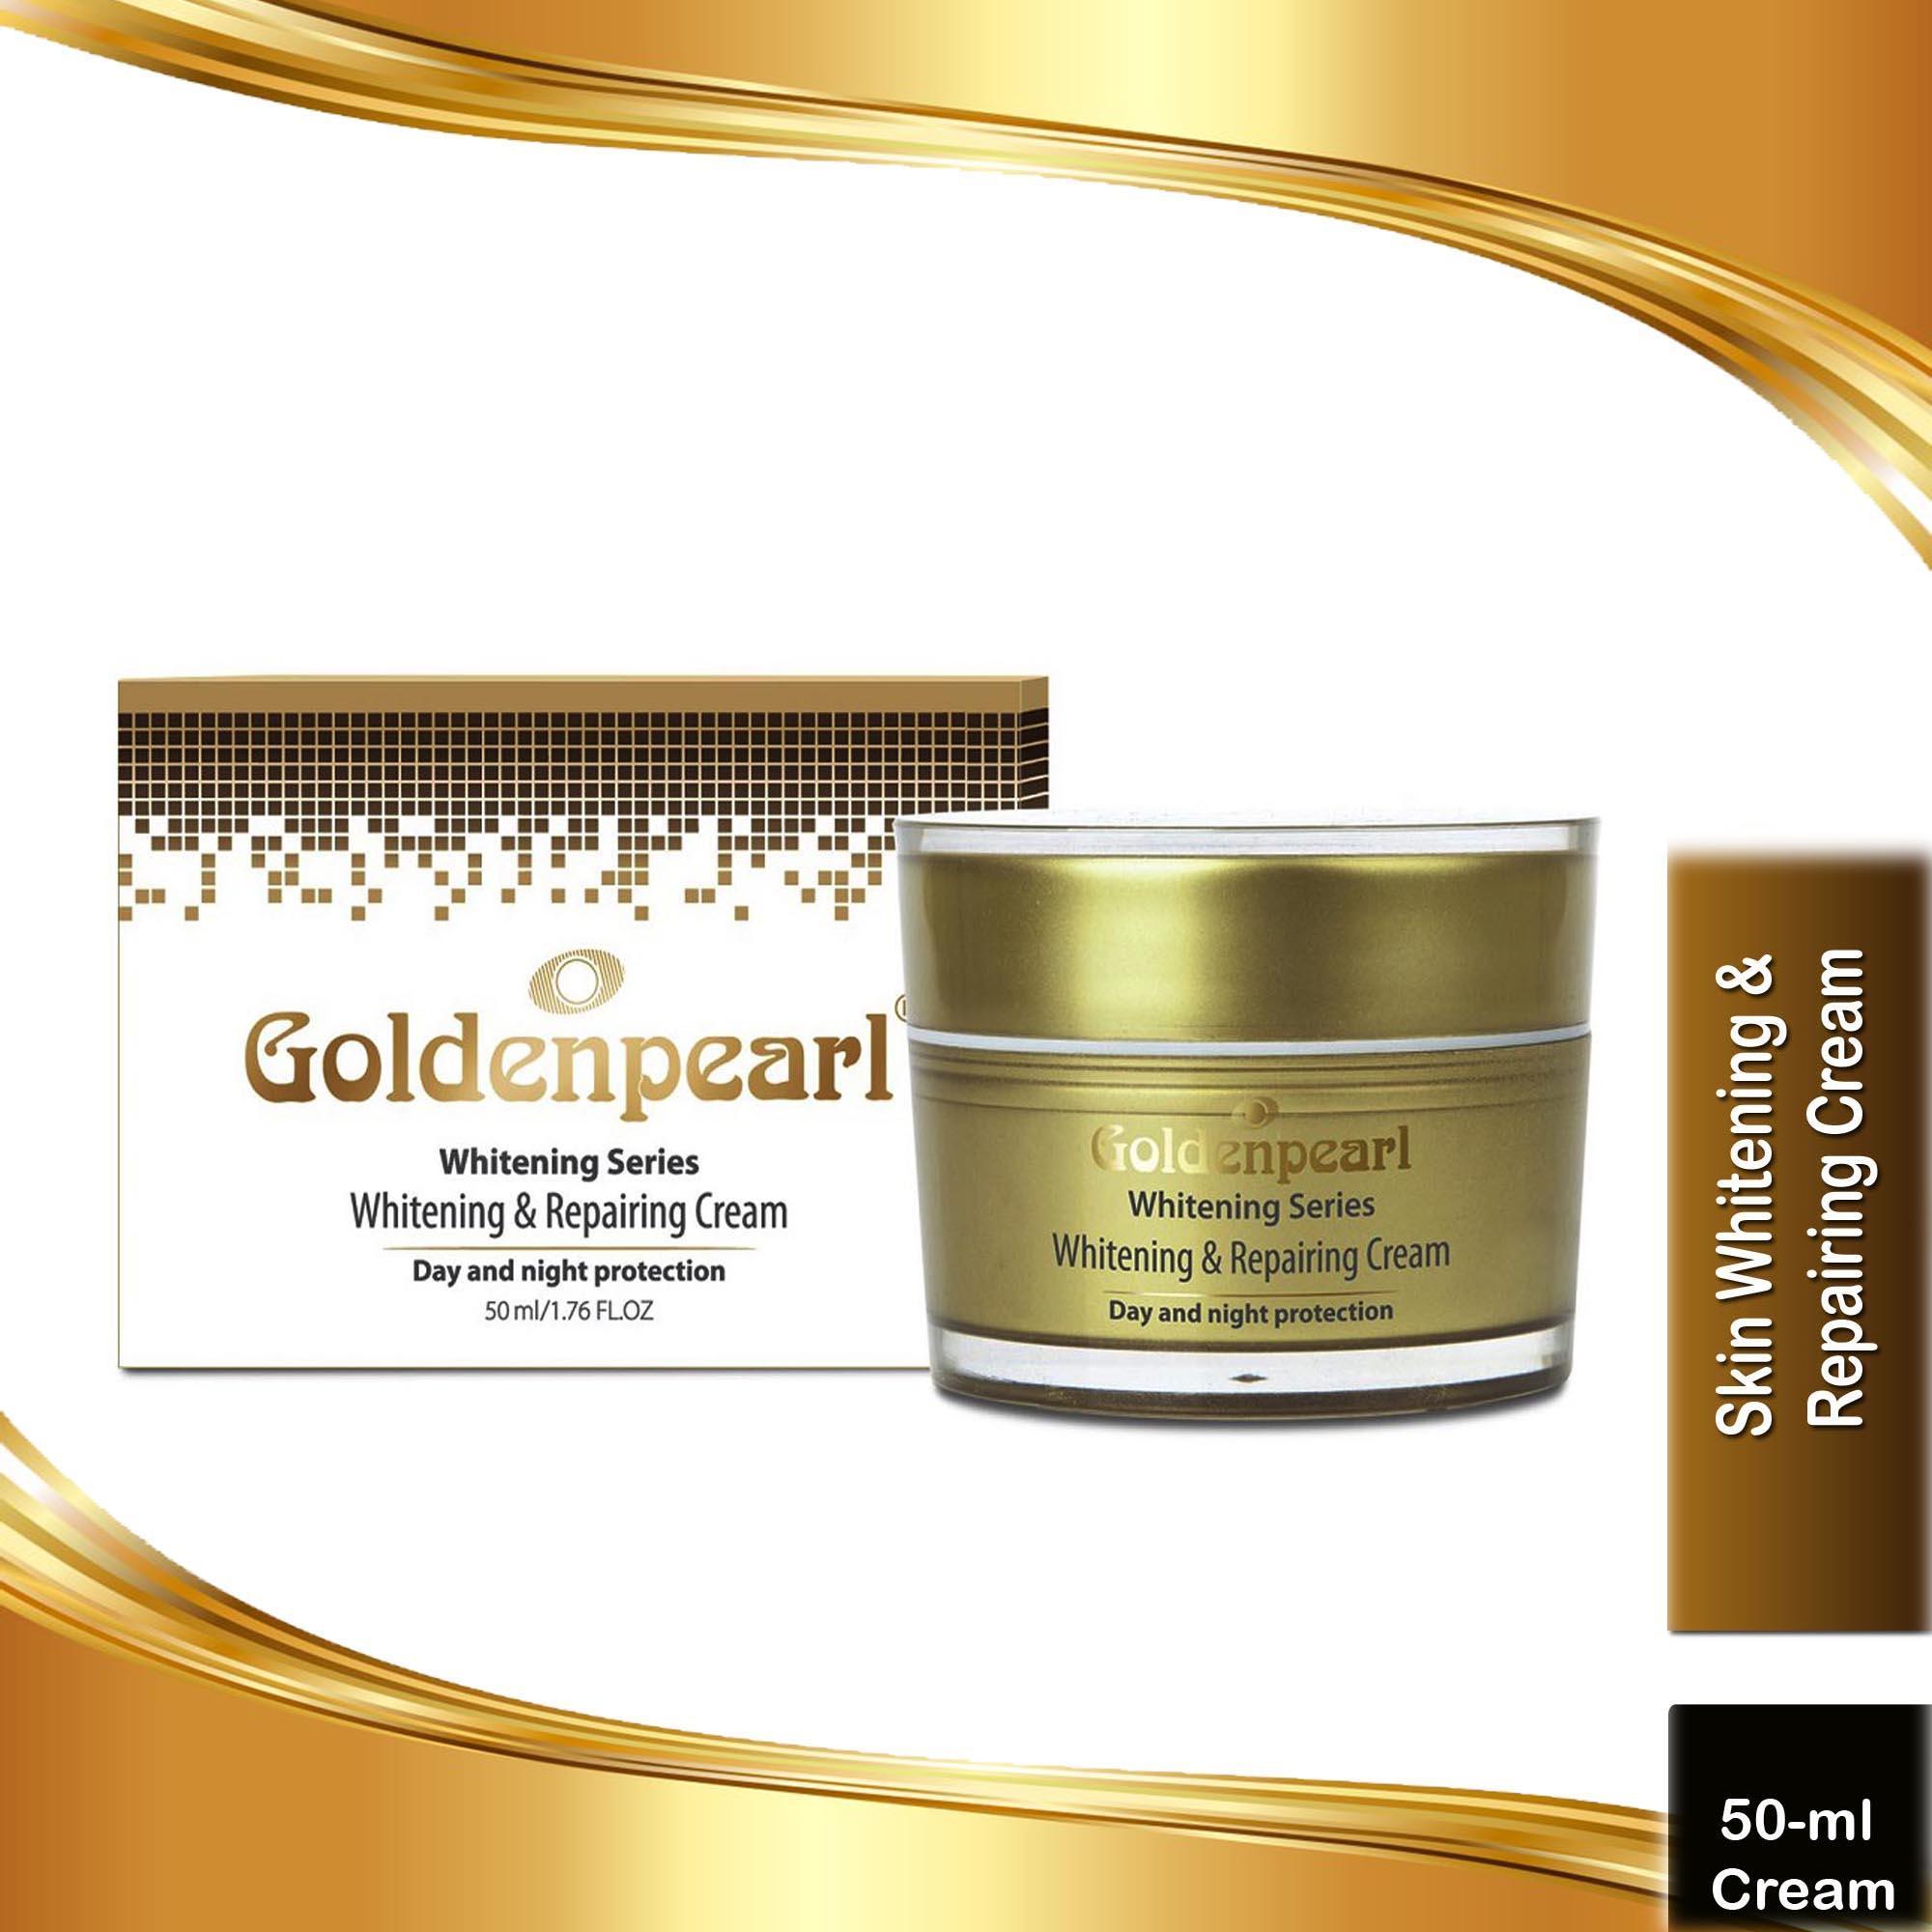 Golden Pearl Whitening Repairing Cream Buy Online At Best Prices In Pakistan Daraz Pk